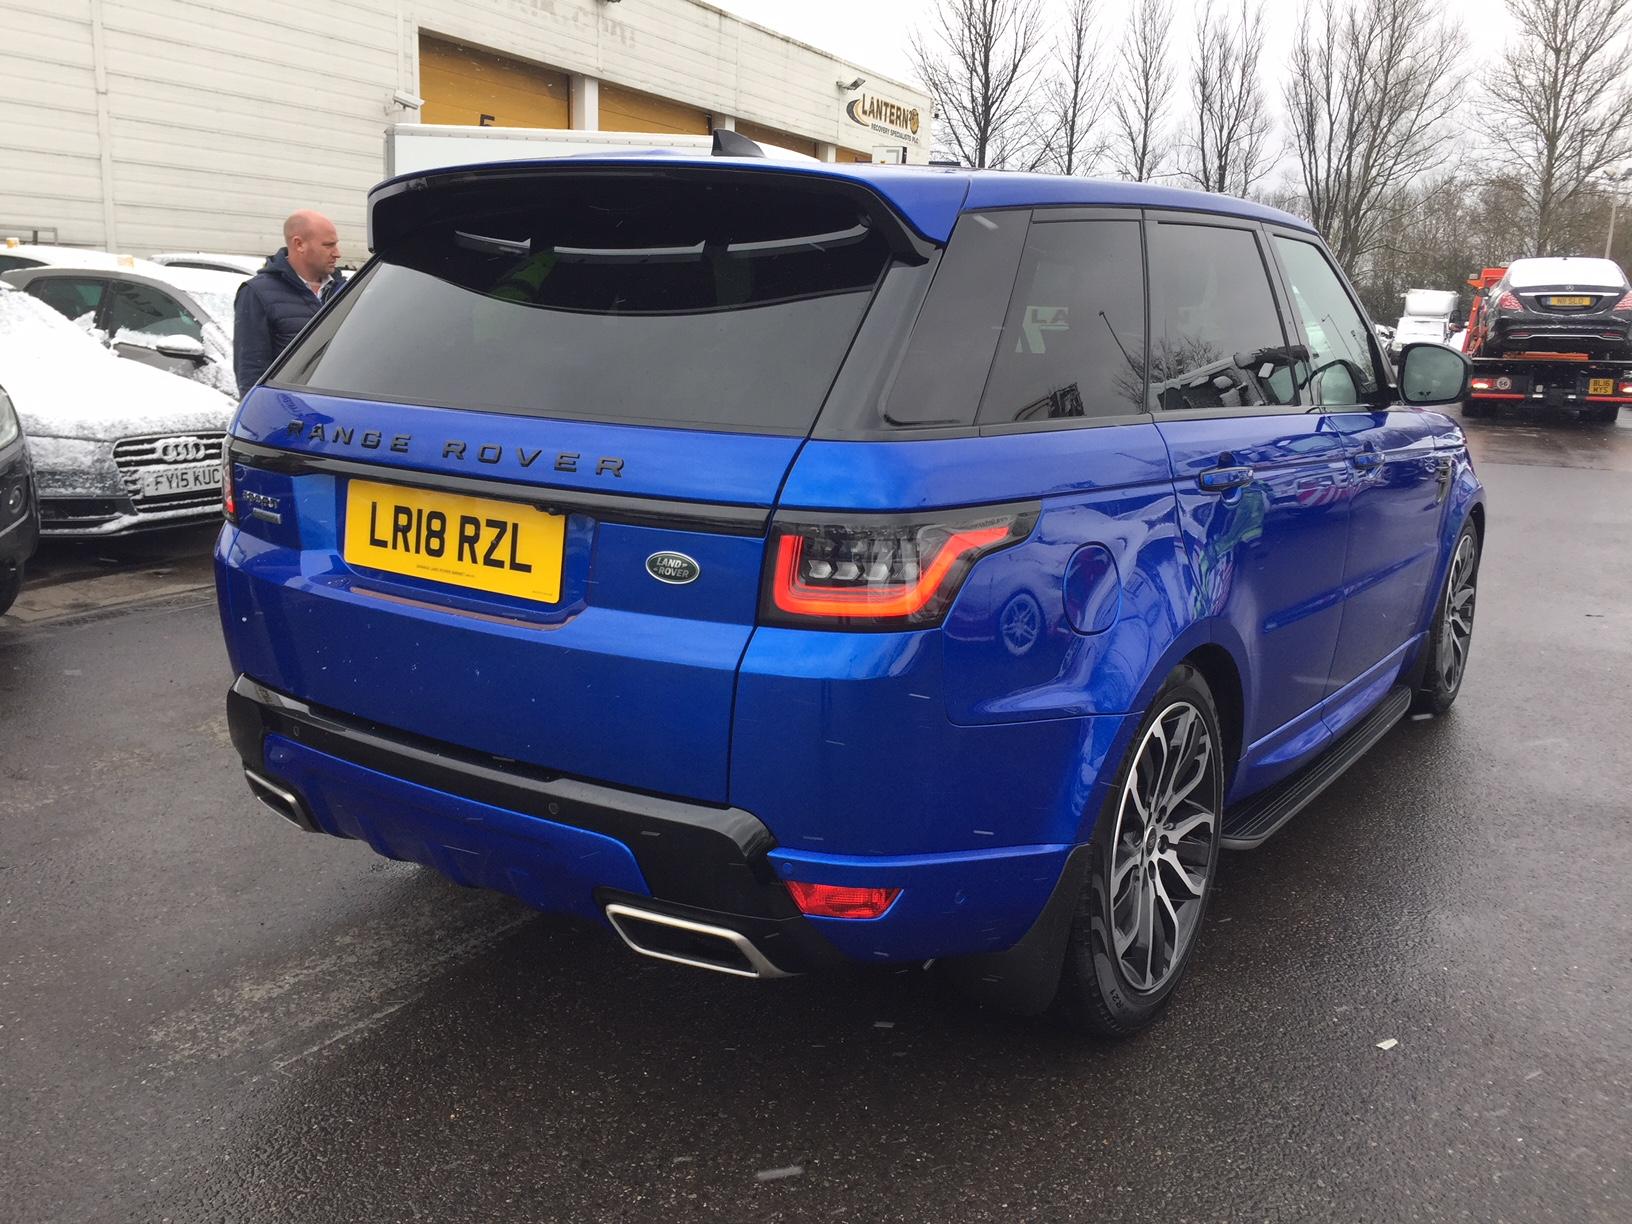 2018 '18' Range Rover Sport 3.0 TDV6 Autobiography